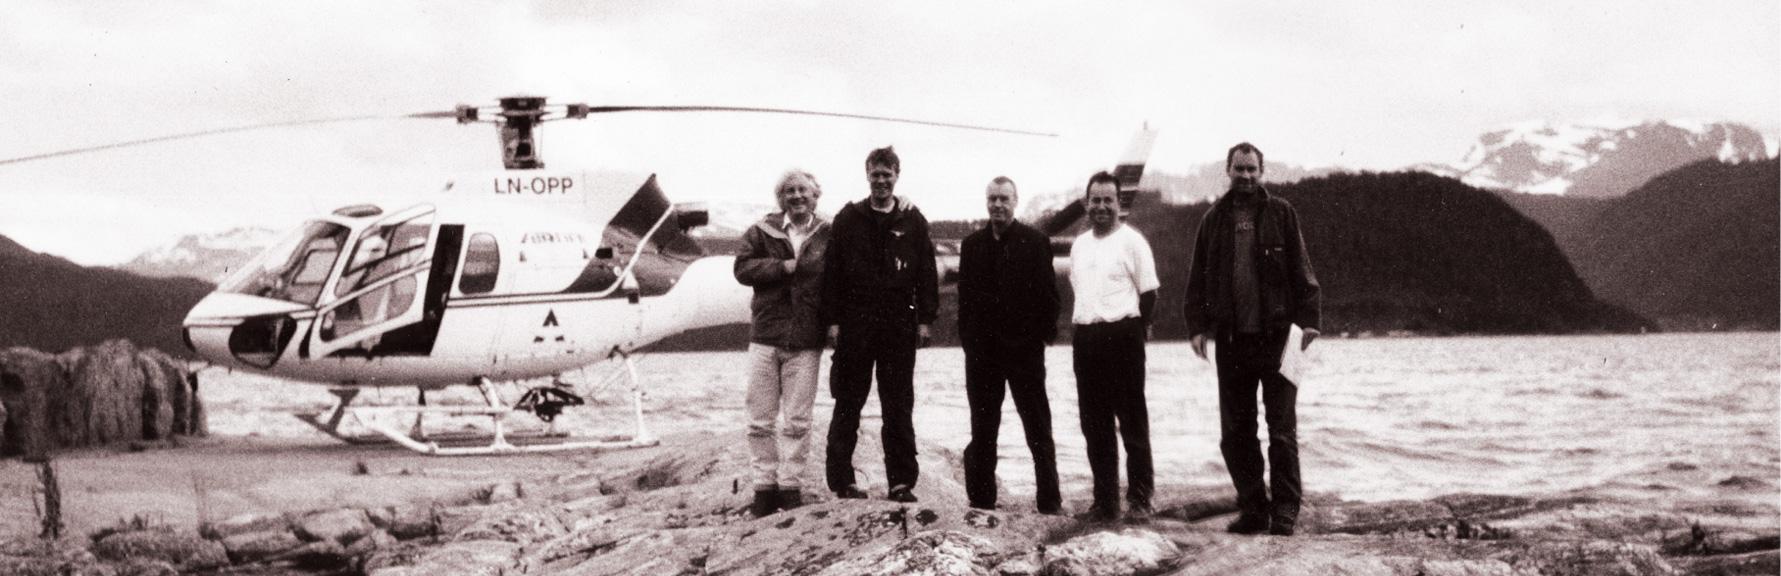 Kemistry - nrk_helicopter